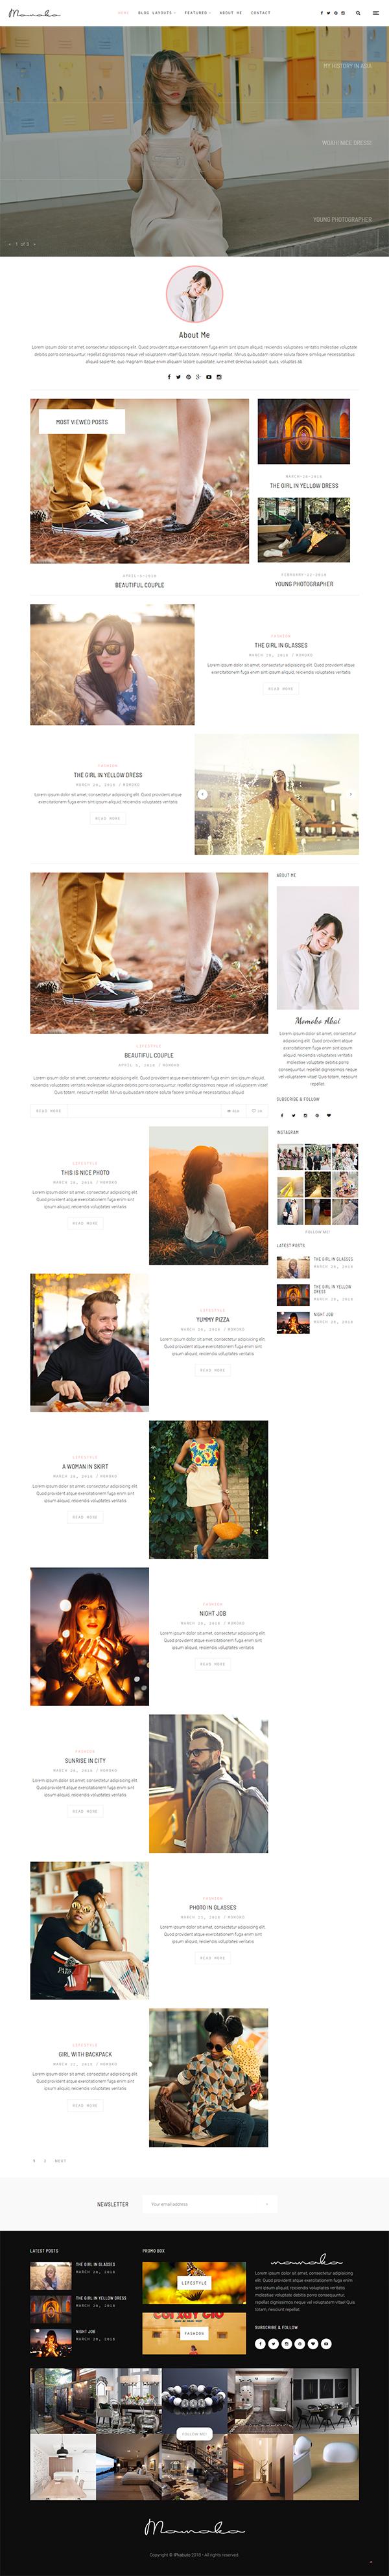 Momoko - Personal WordPress Blog Theme